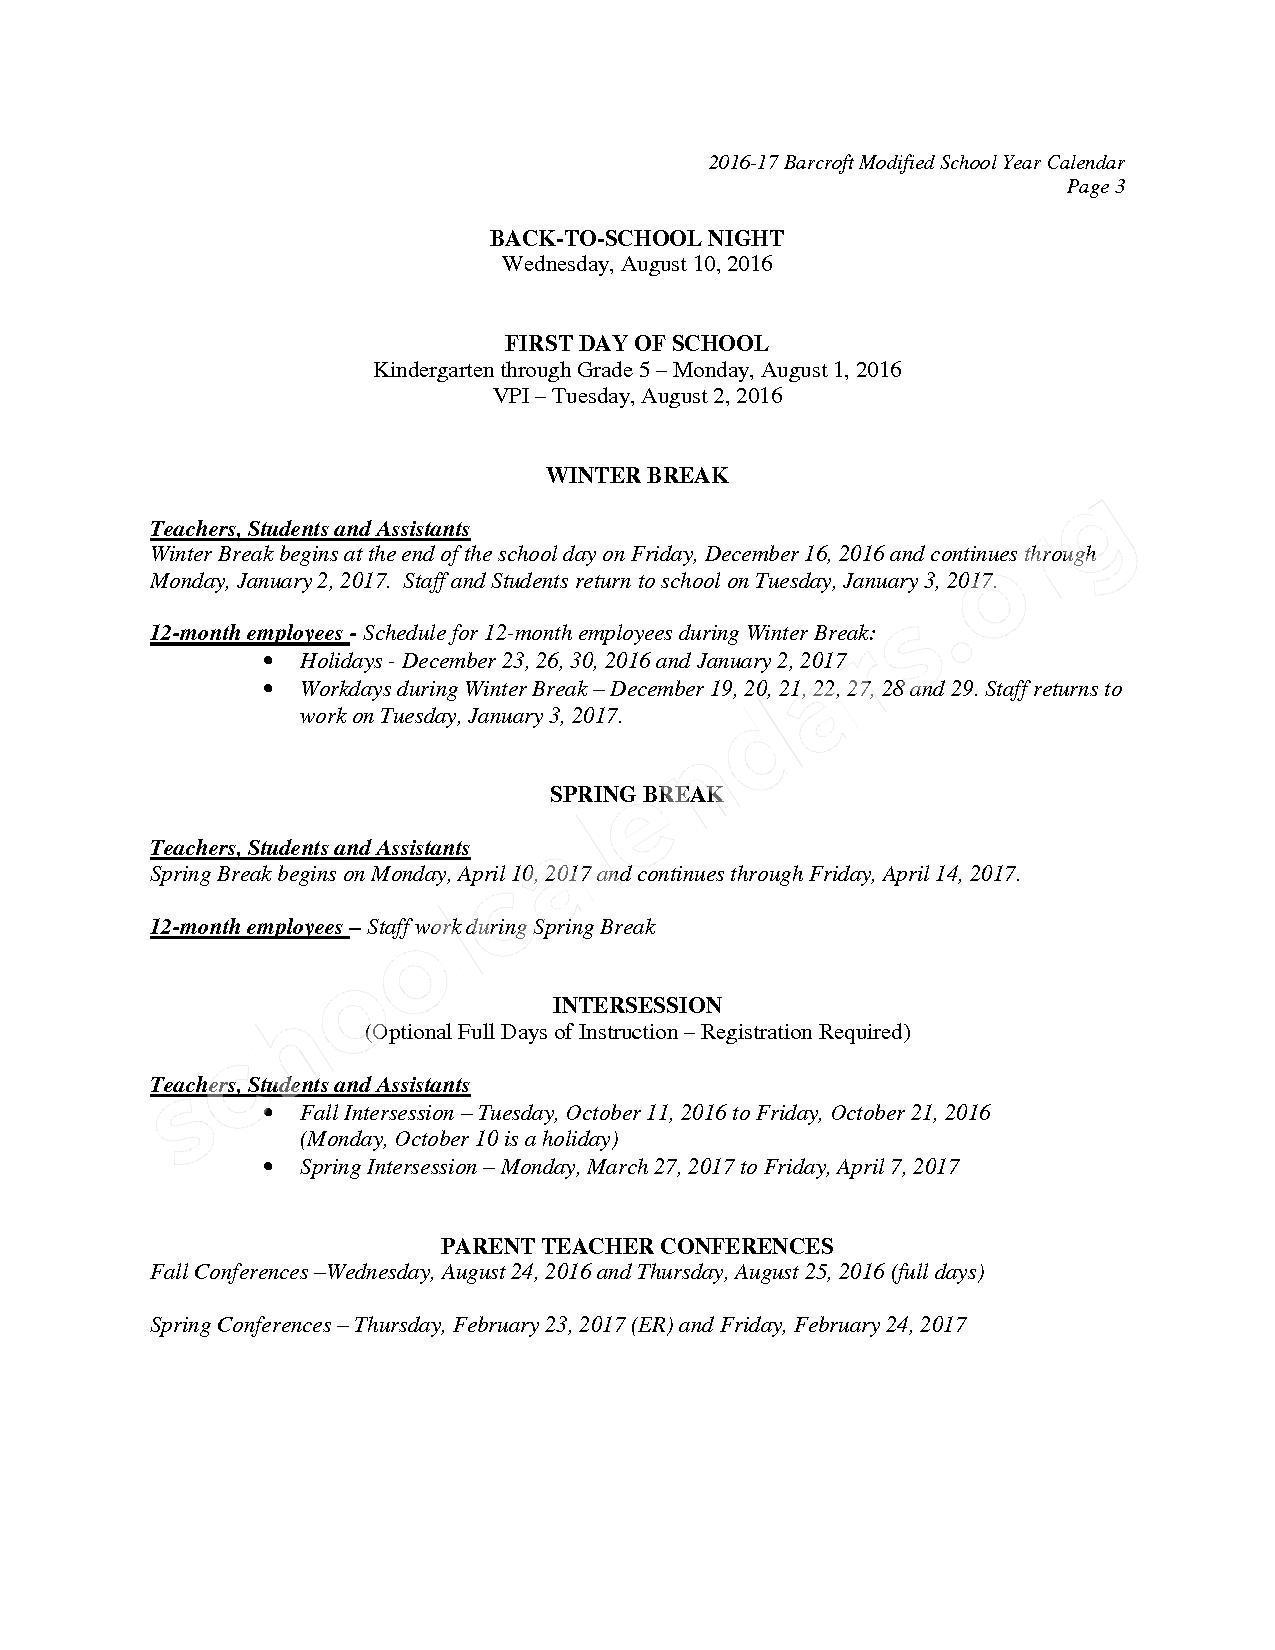 2016 - 2017 Barcroft Calendar – Barcroft Elementary School – page 4